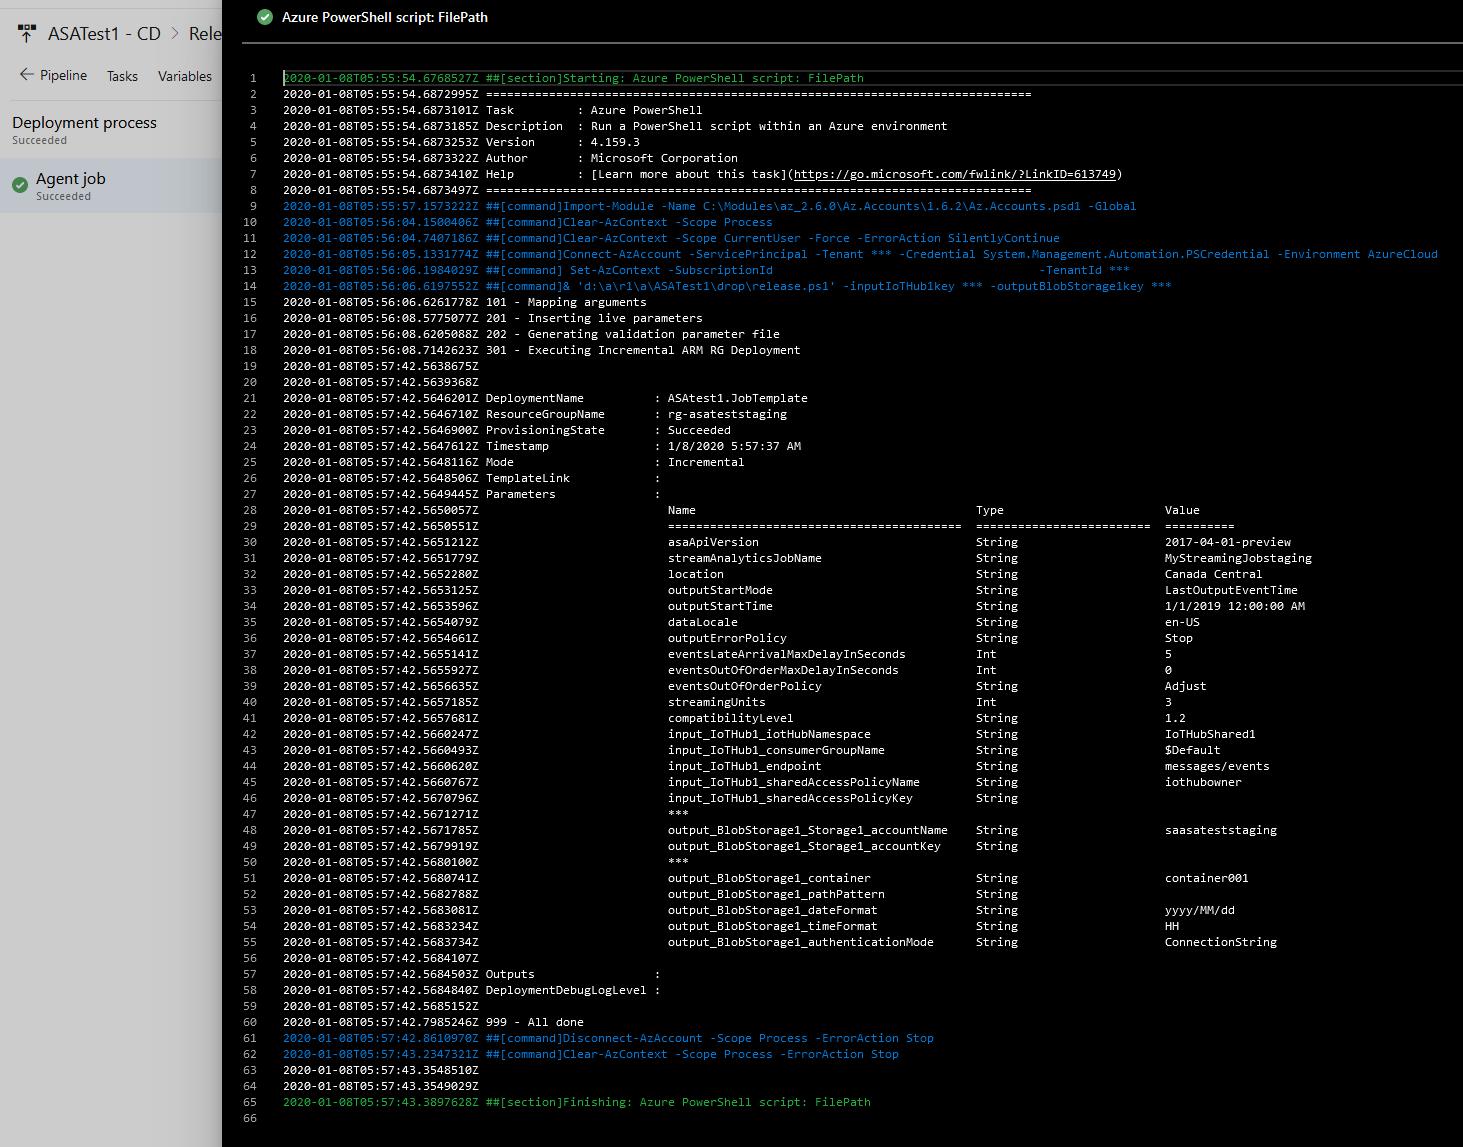 Screenshot of Azure DevOps: log of a successful release